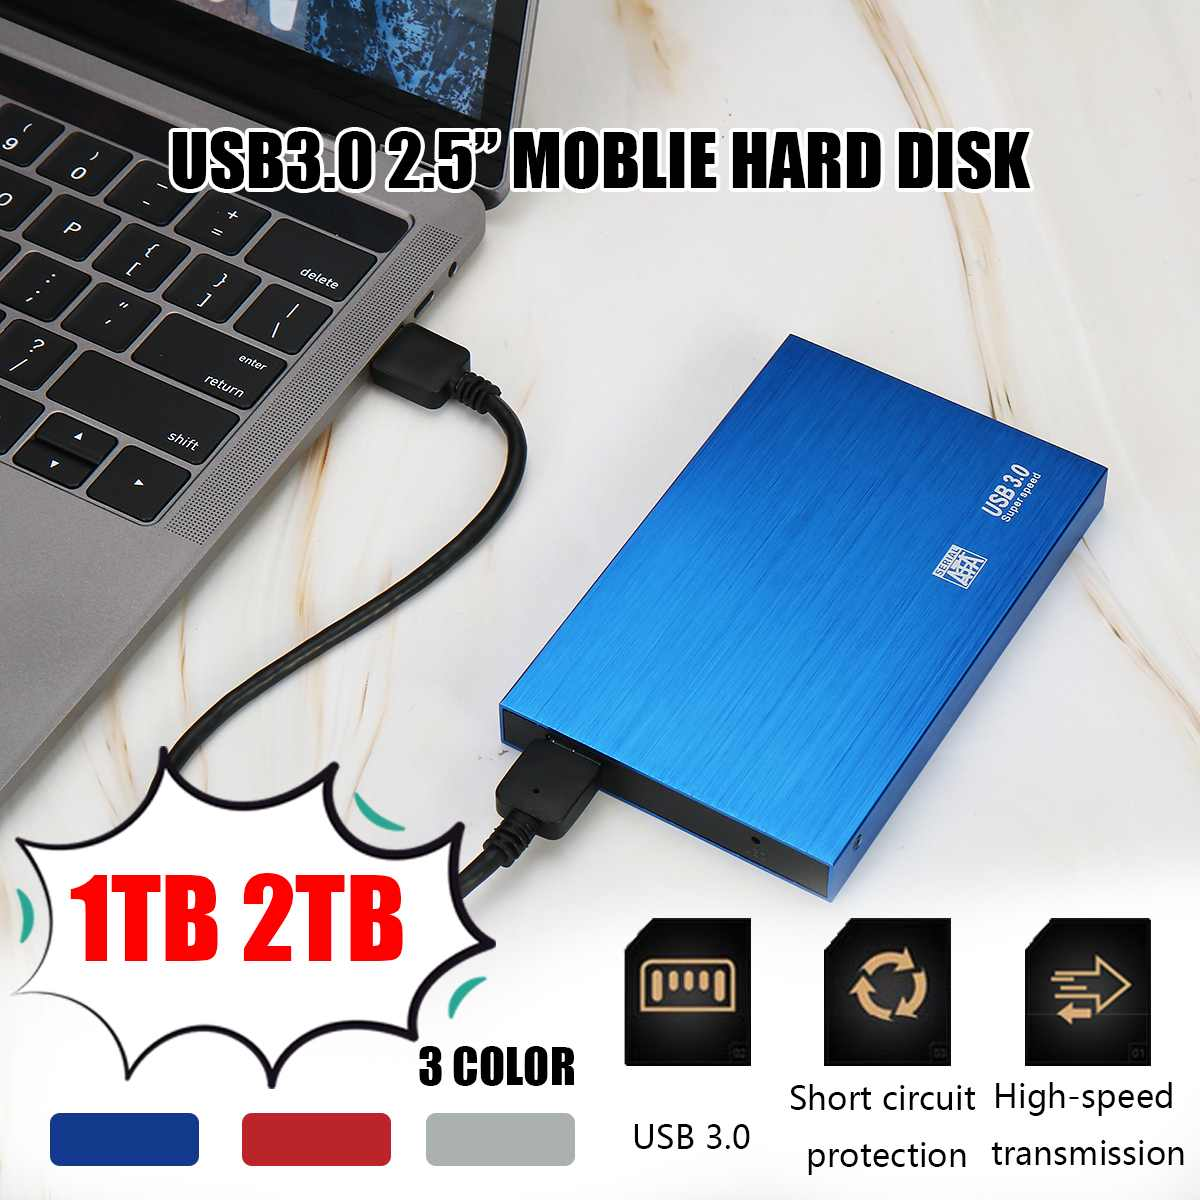 2.5 External Hard Drive Storage USB3.0 HDD Anti-vibration and anti-fall mobile hard disk For Mac TV box 1TB 2TB